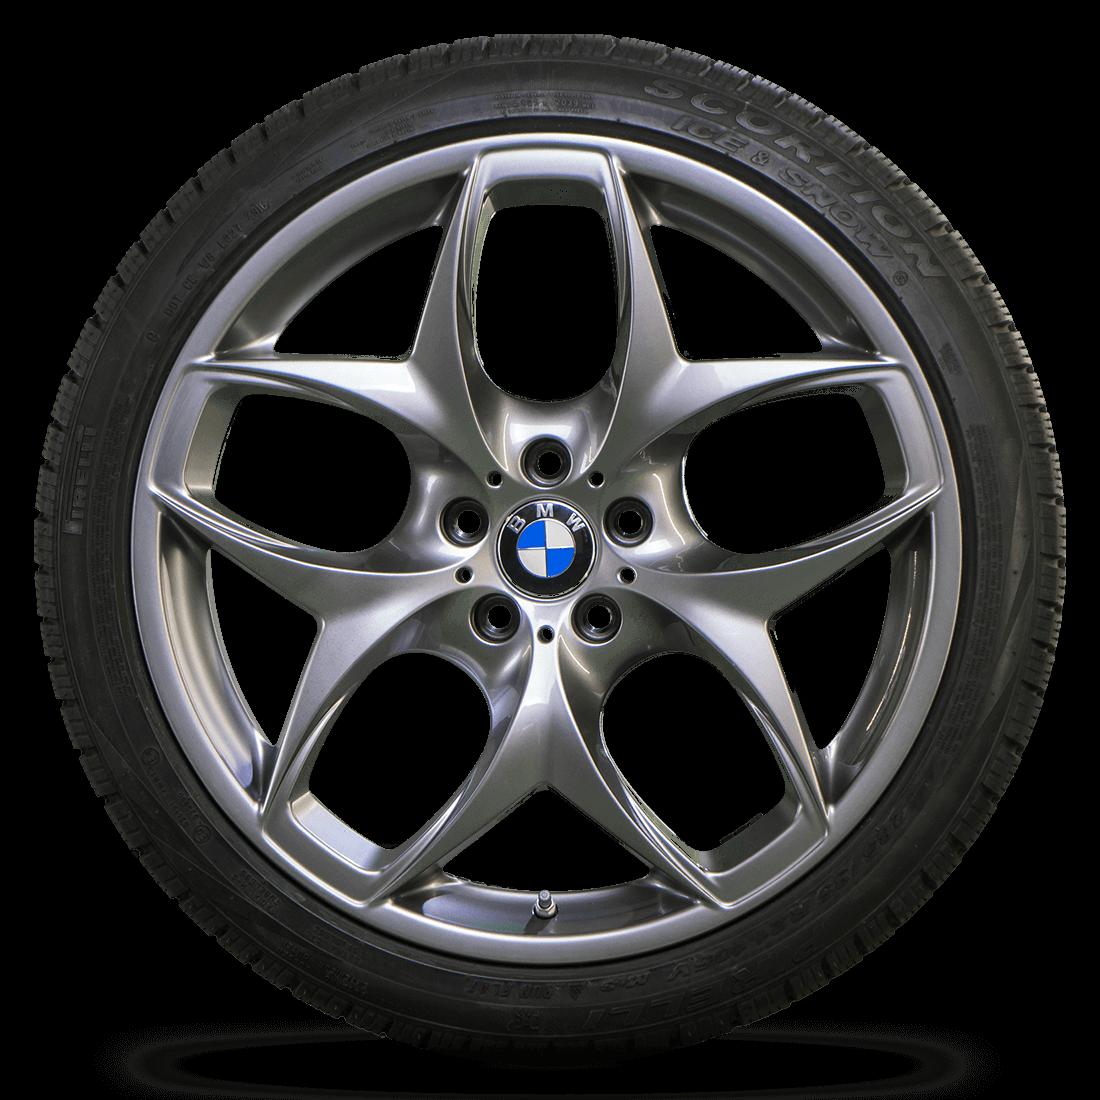 Original BMW 21 Zoll Winterreifen X5 E70 F15 X5M X6 E71 F16 X6M Winterräder 215